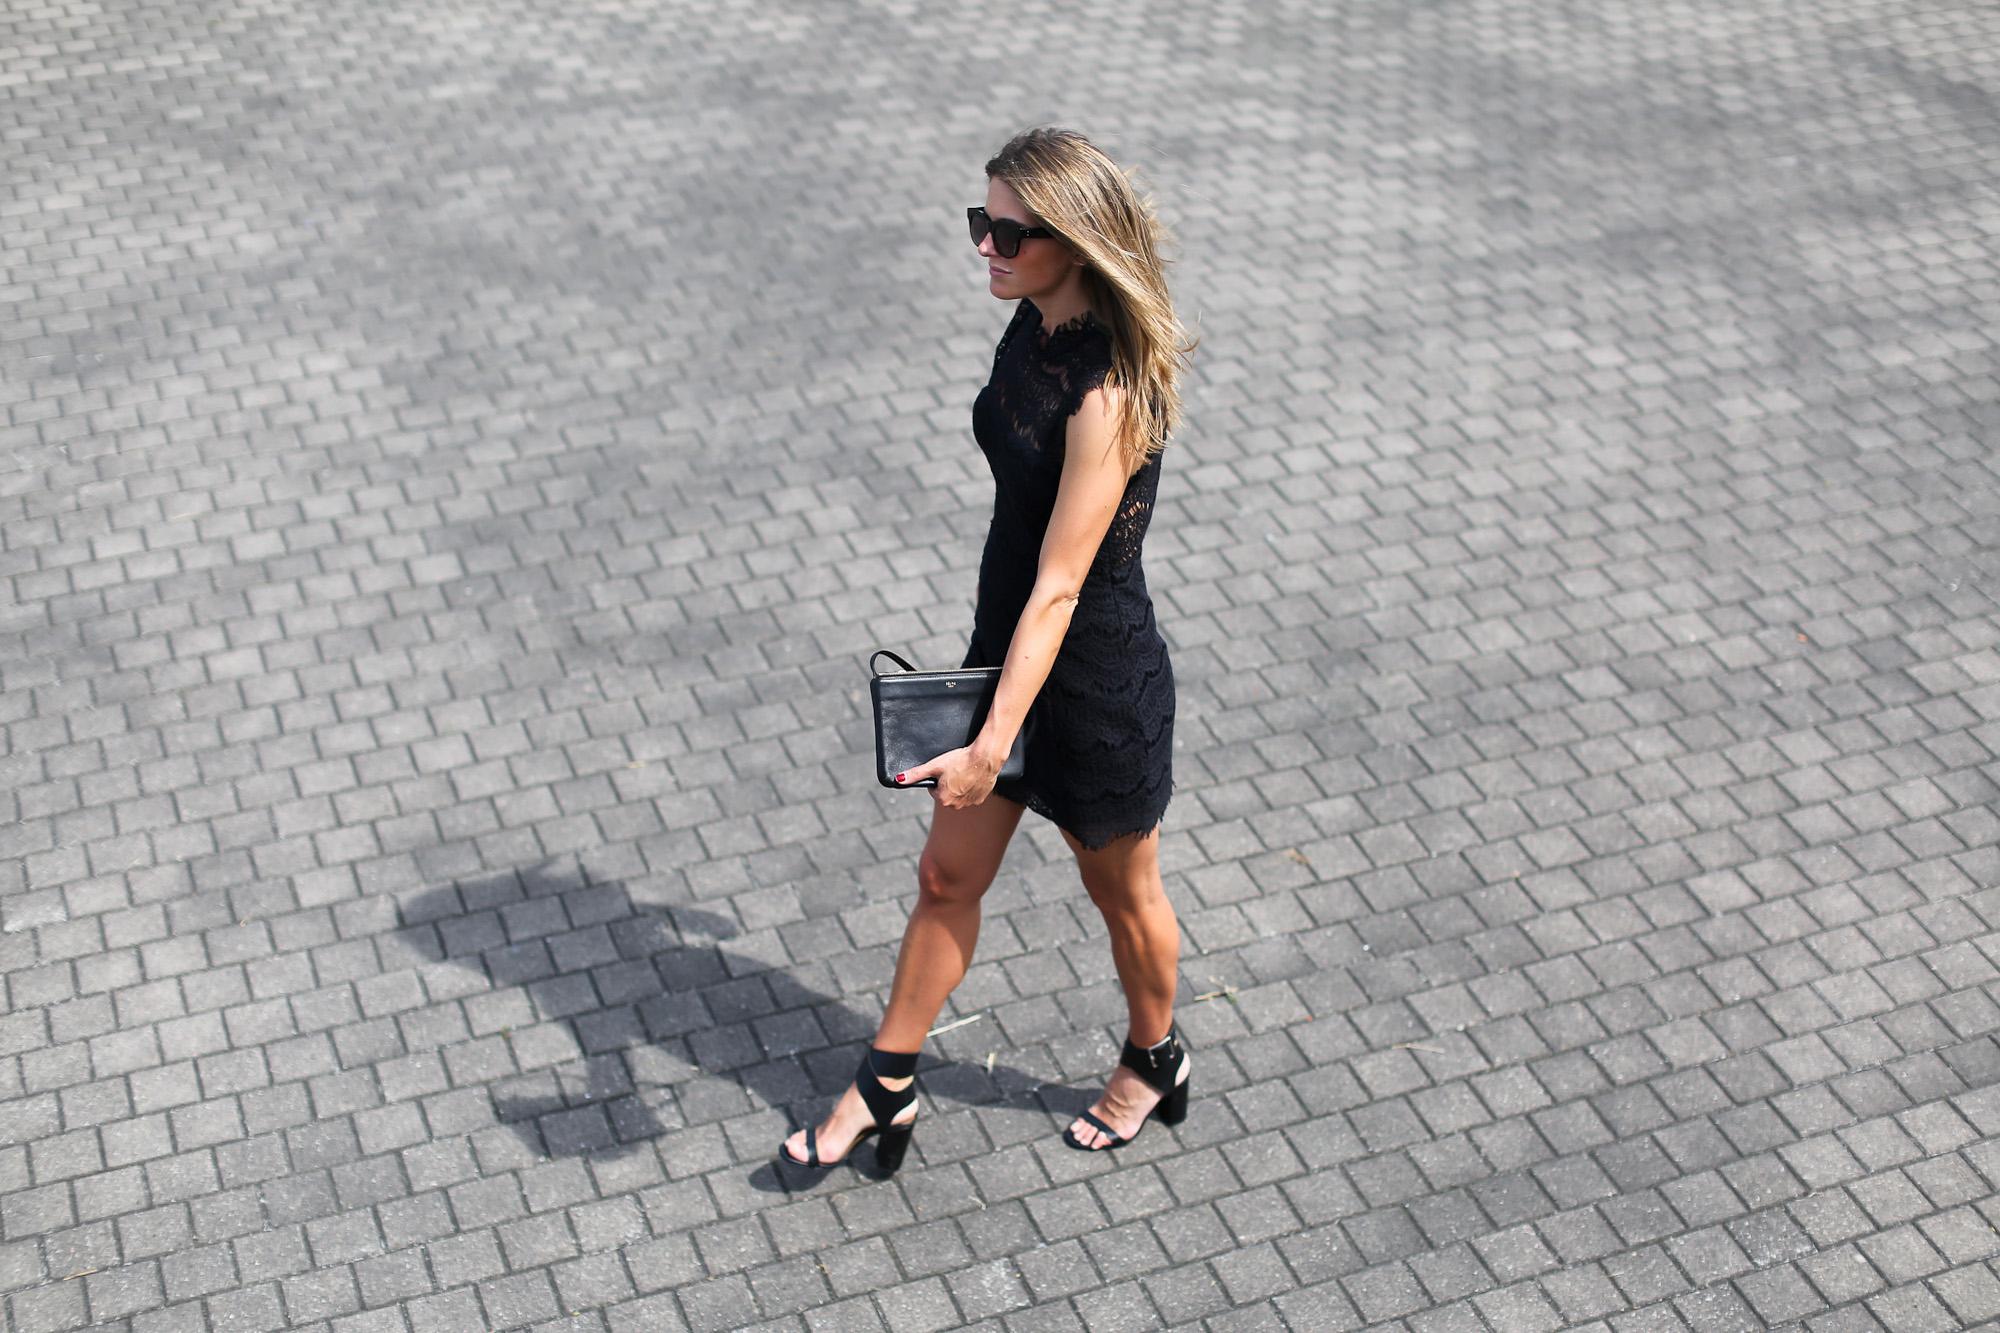 Clochet_streetstyle_tiesandheels_vestidovintagesweet_bailarinaspunteraconbrillos-5